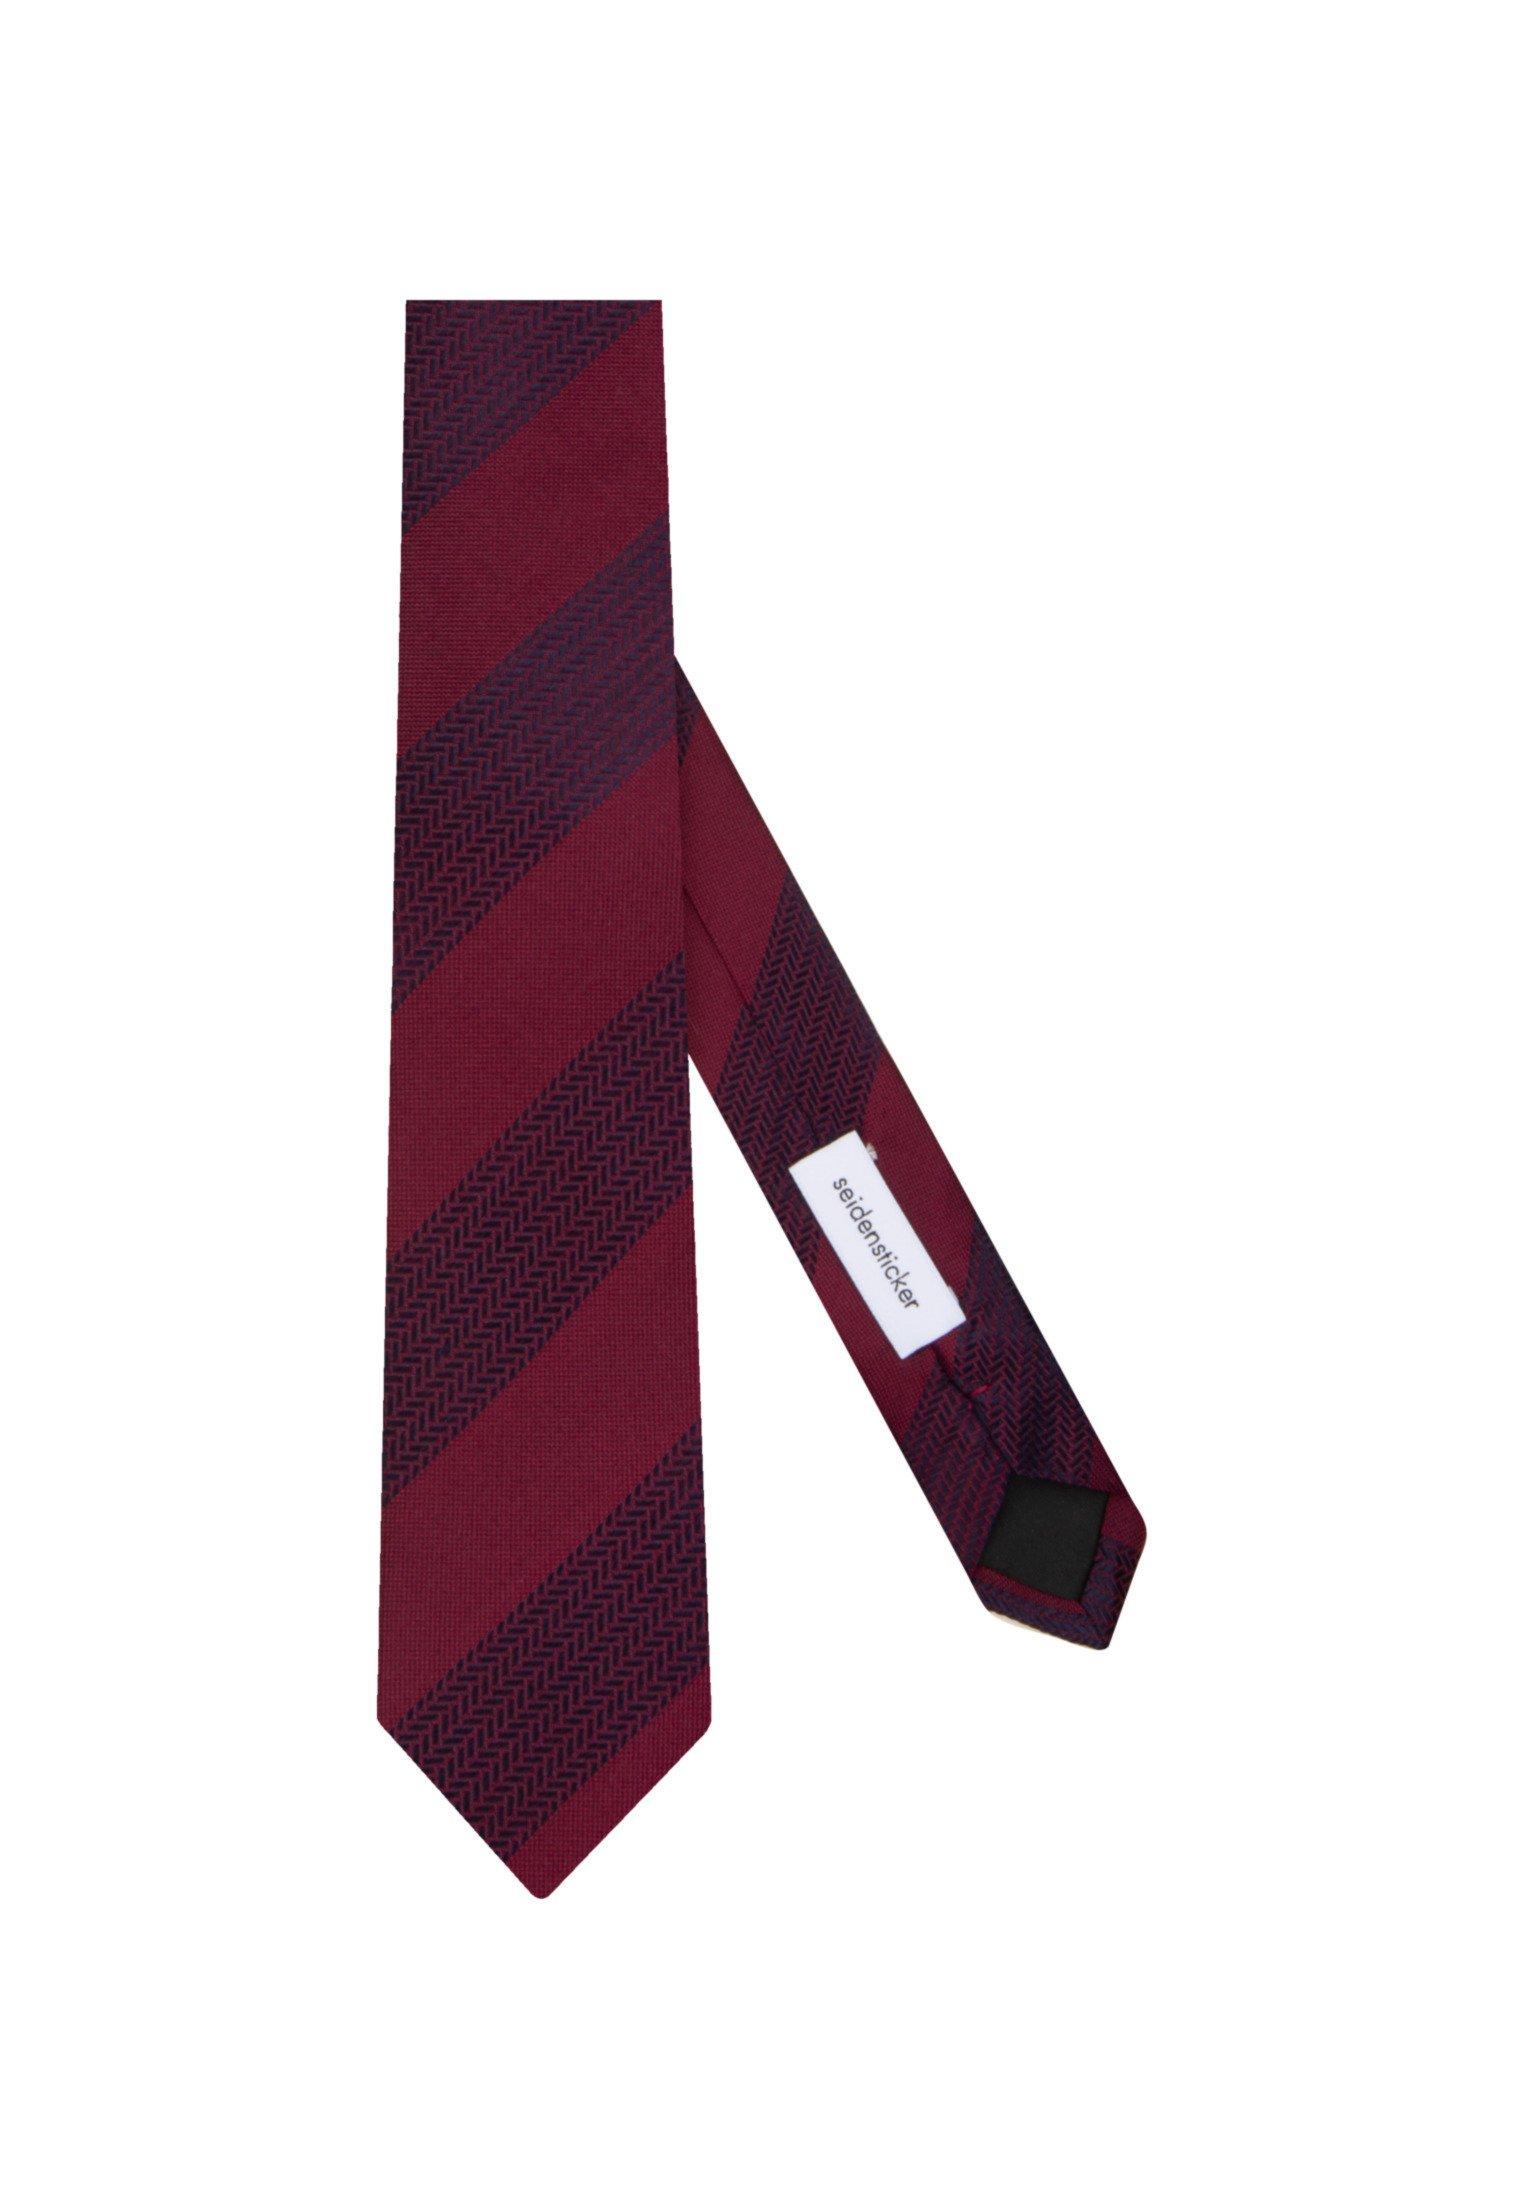 Seidensticker Krawatte - rot - Herrenaccessoires vlF2N